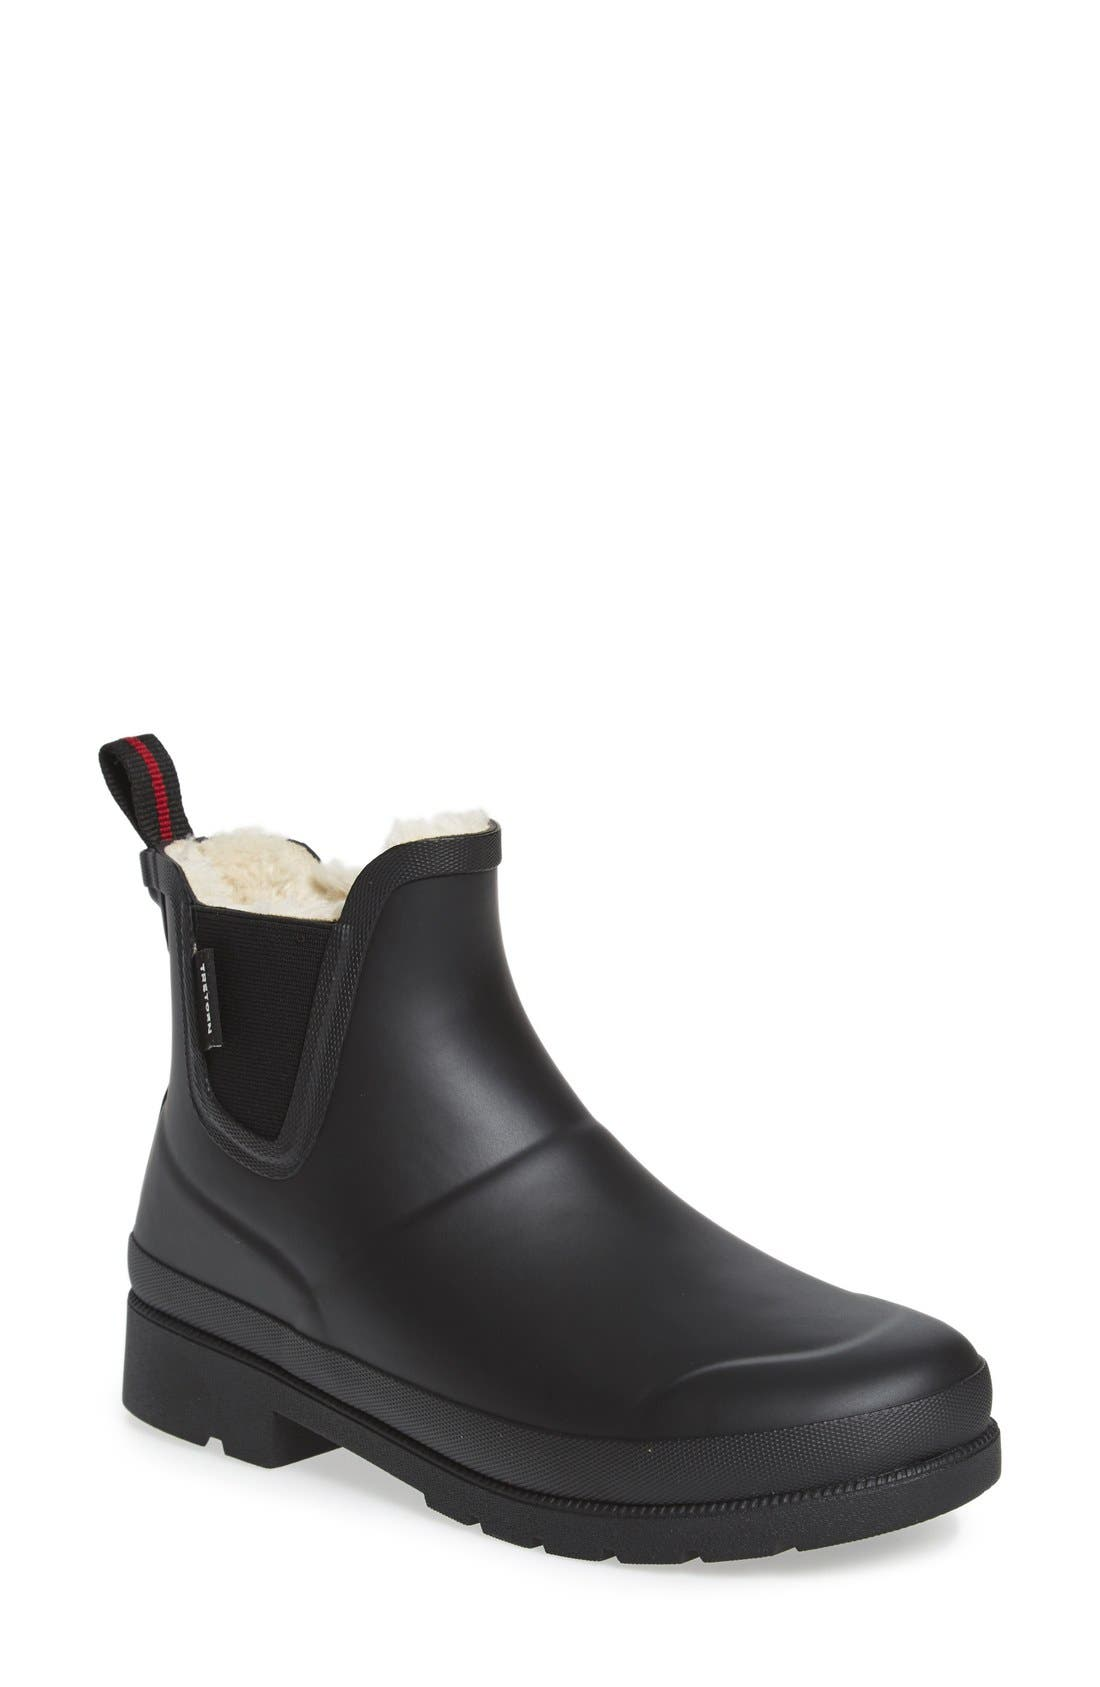 Tretorn Chelsea Rain Boot, Black